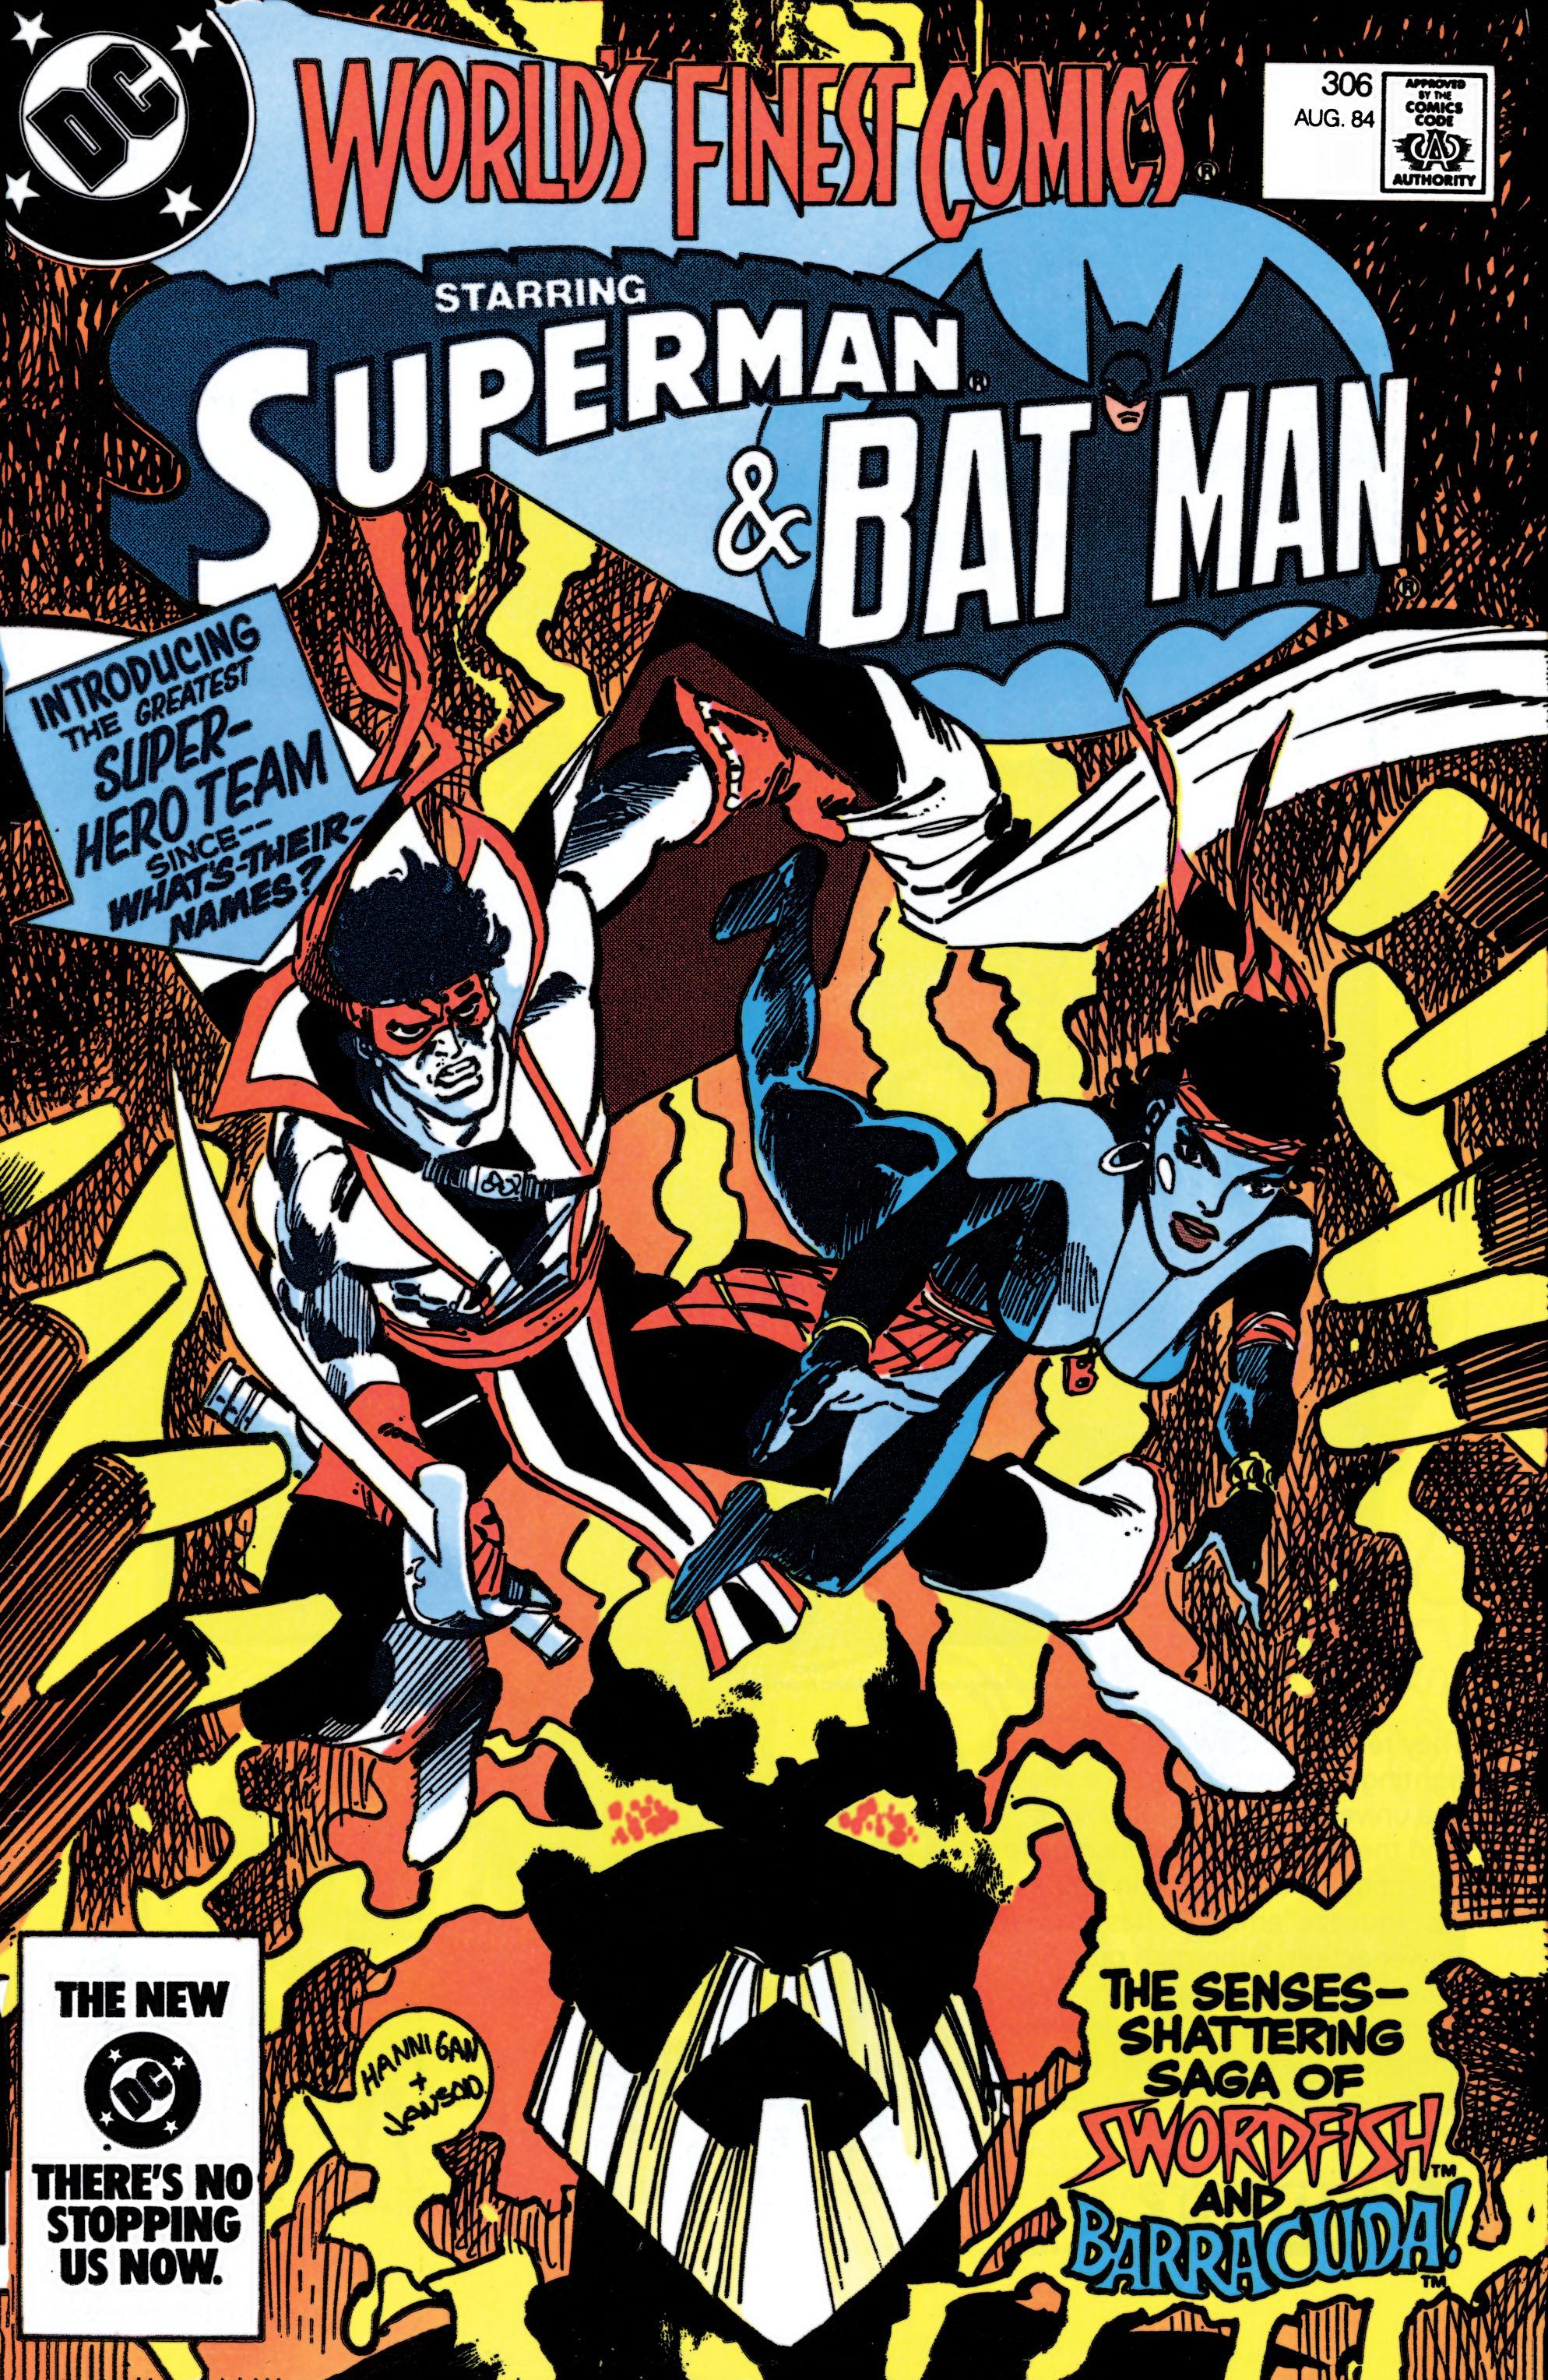 Read online World's Finest Comics comic -  Issue #306 - 1